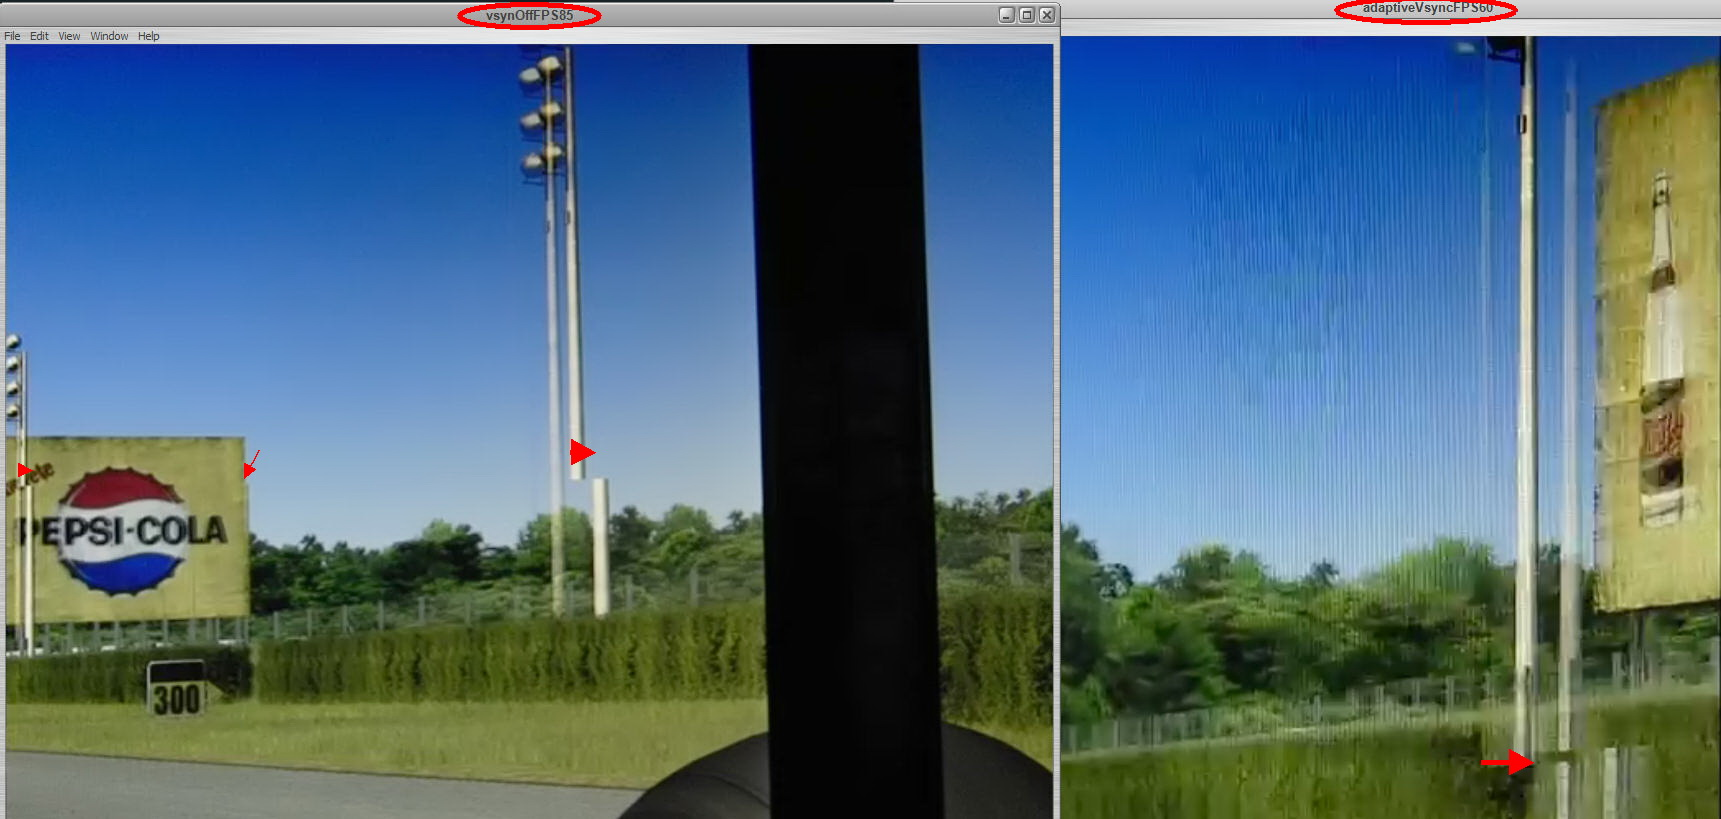 adaptive vs sync off.jpg